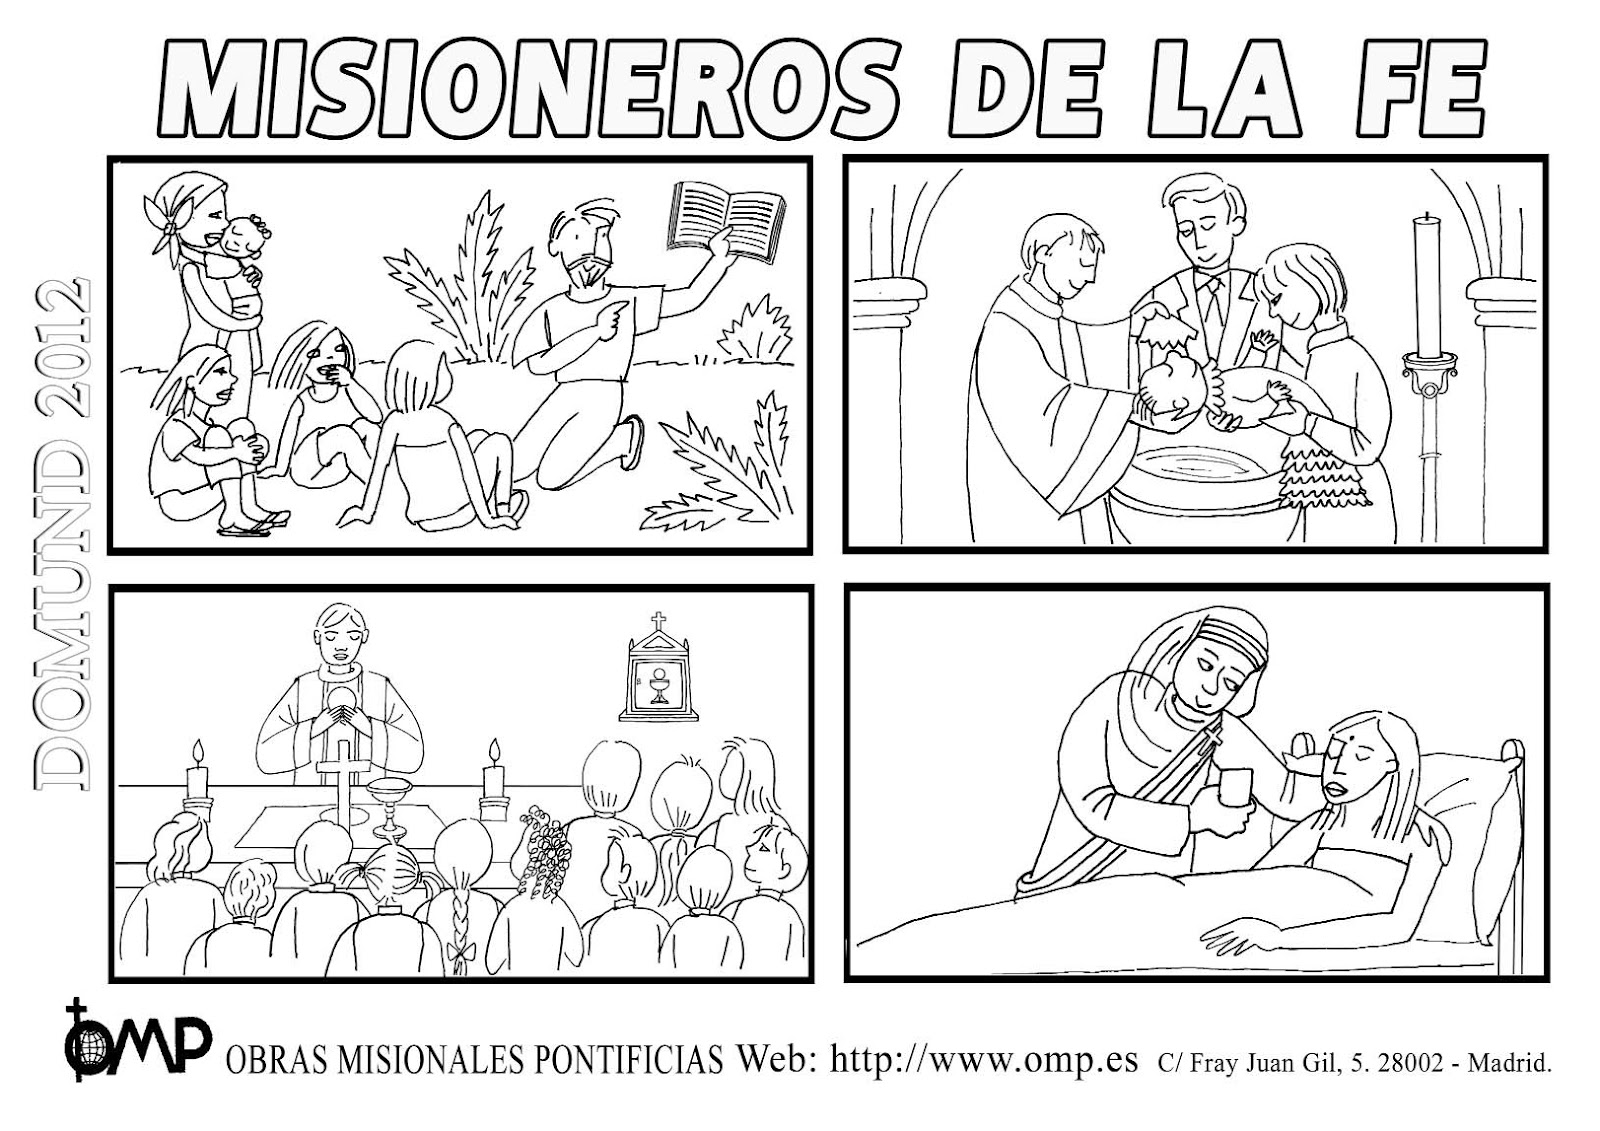 Aventuras con Jesús: abril 2013